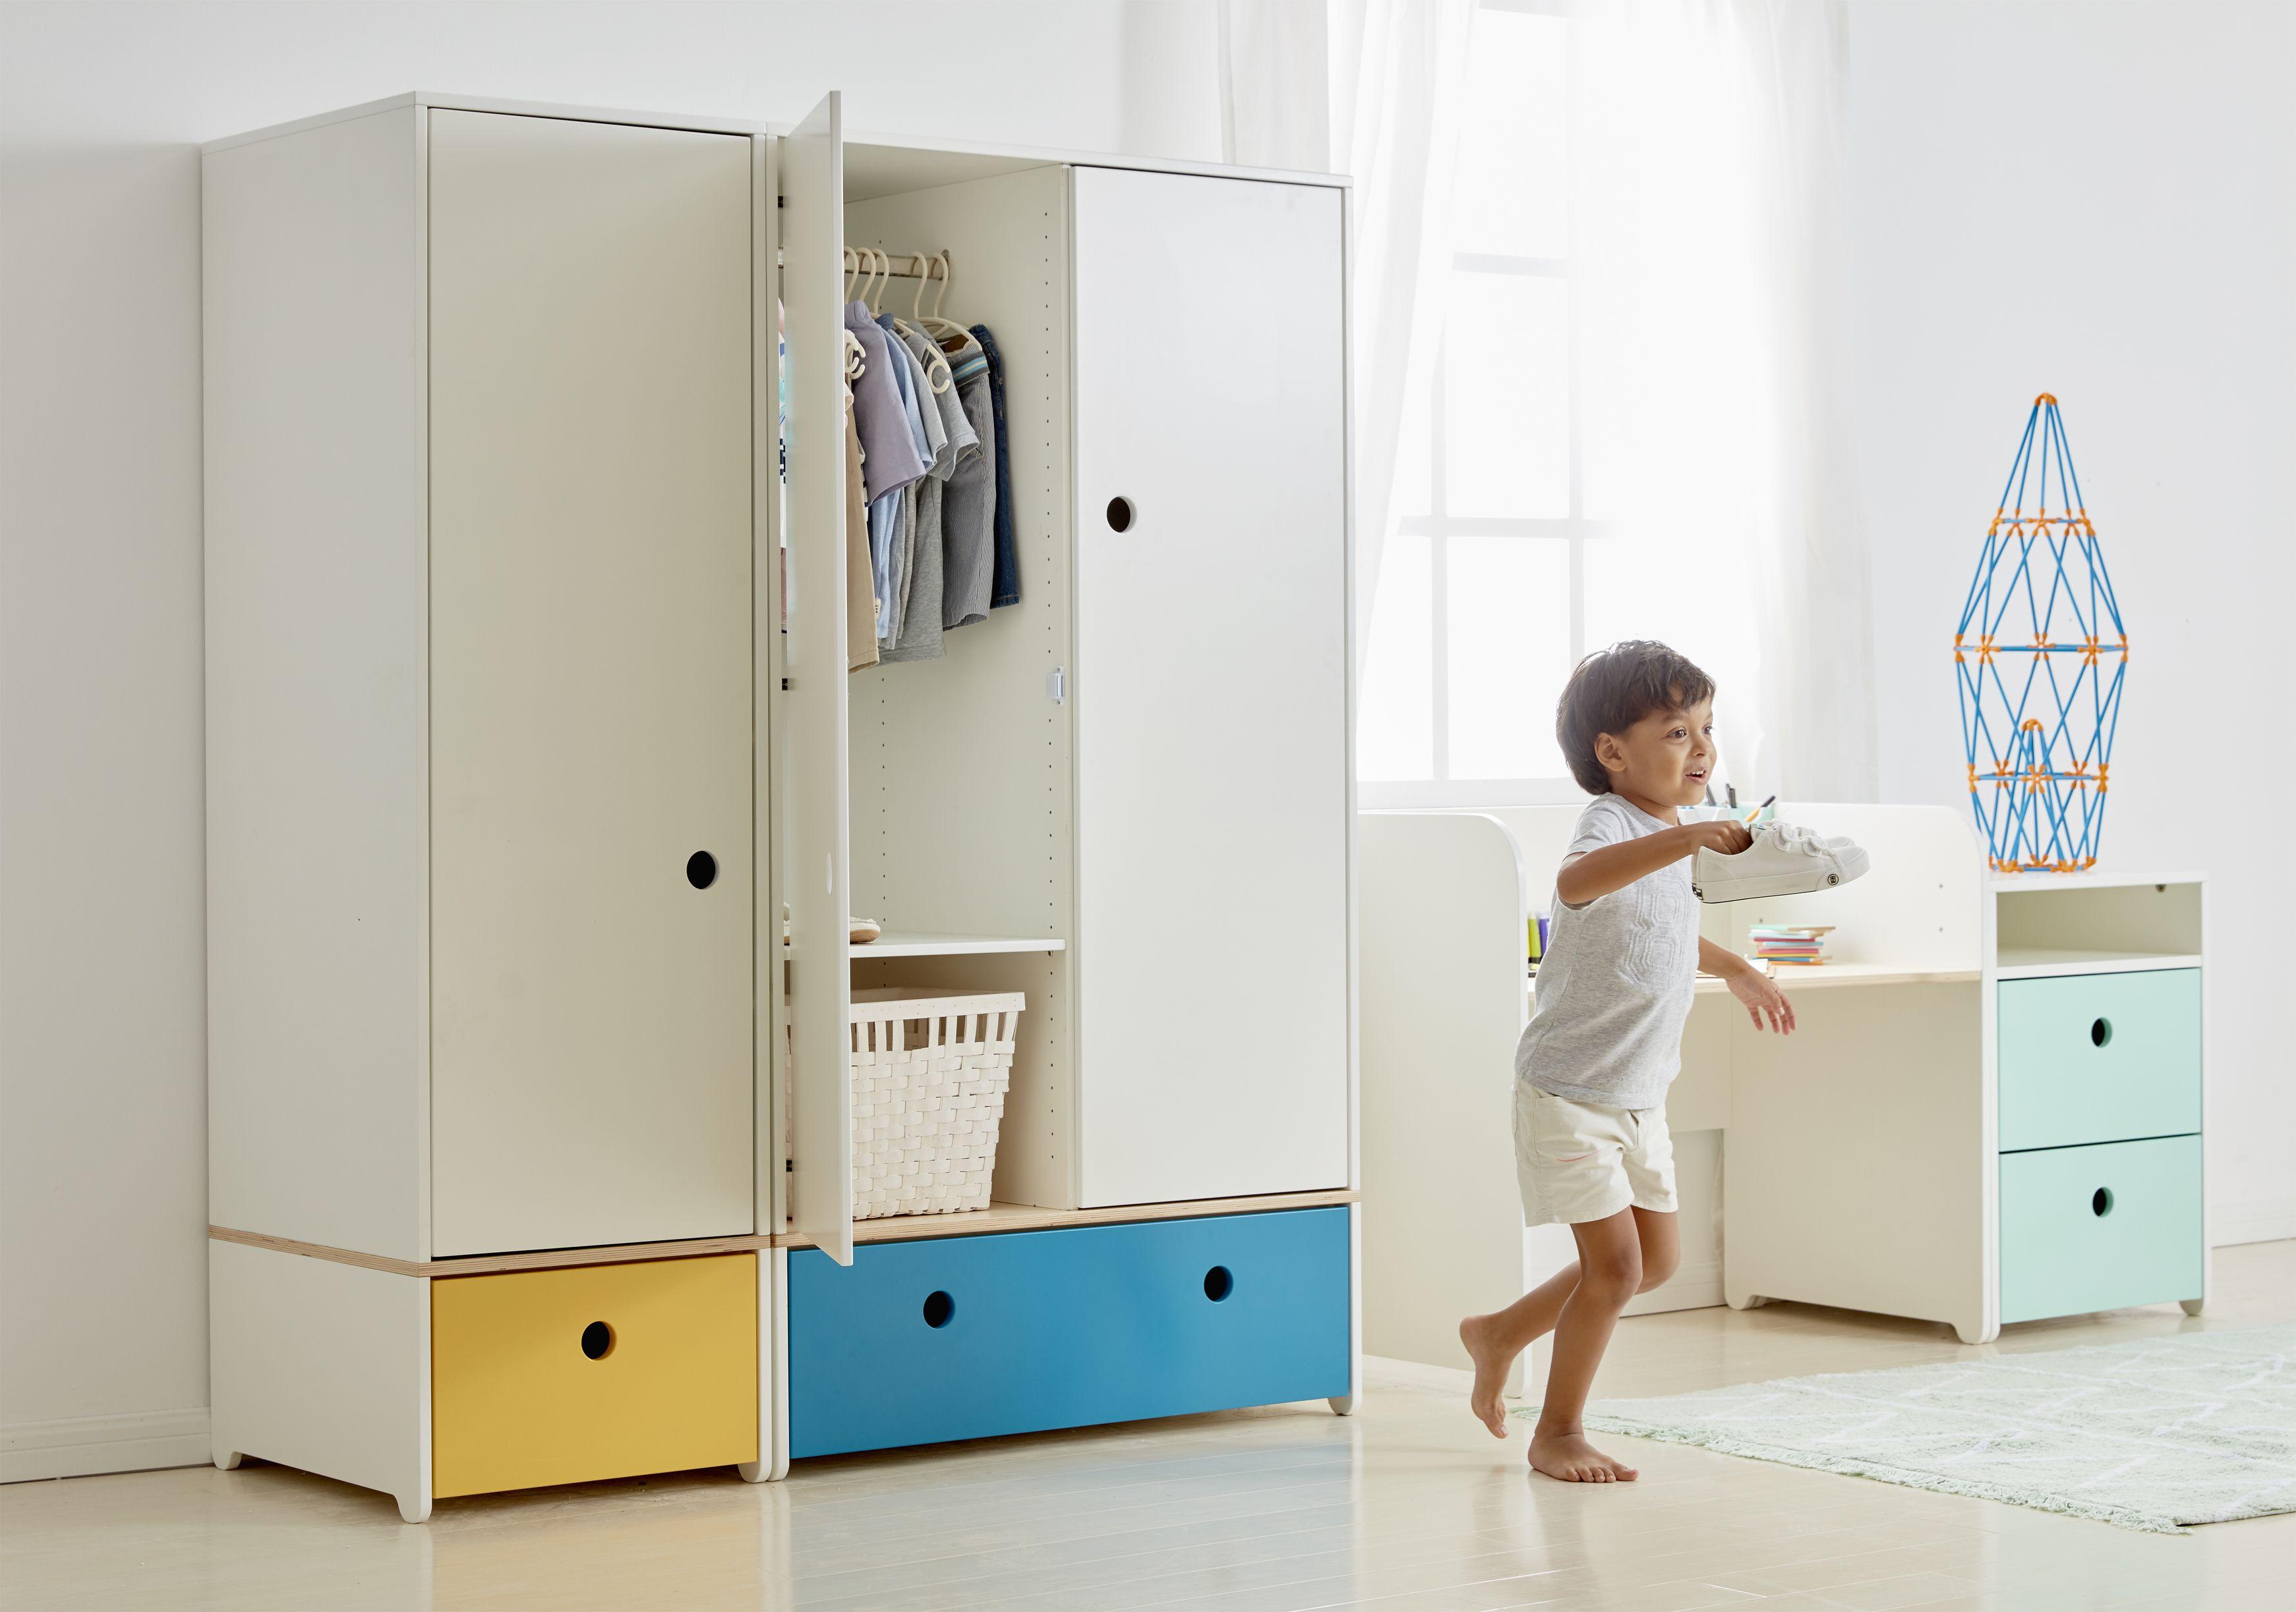 Meuble Rangement Enfant Ikea Stuva Meuble Rangement Enfant Decoration Chambre Enfant Idee Chambre Enfant